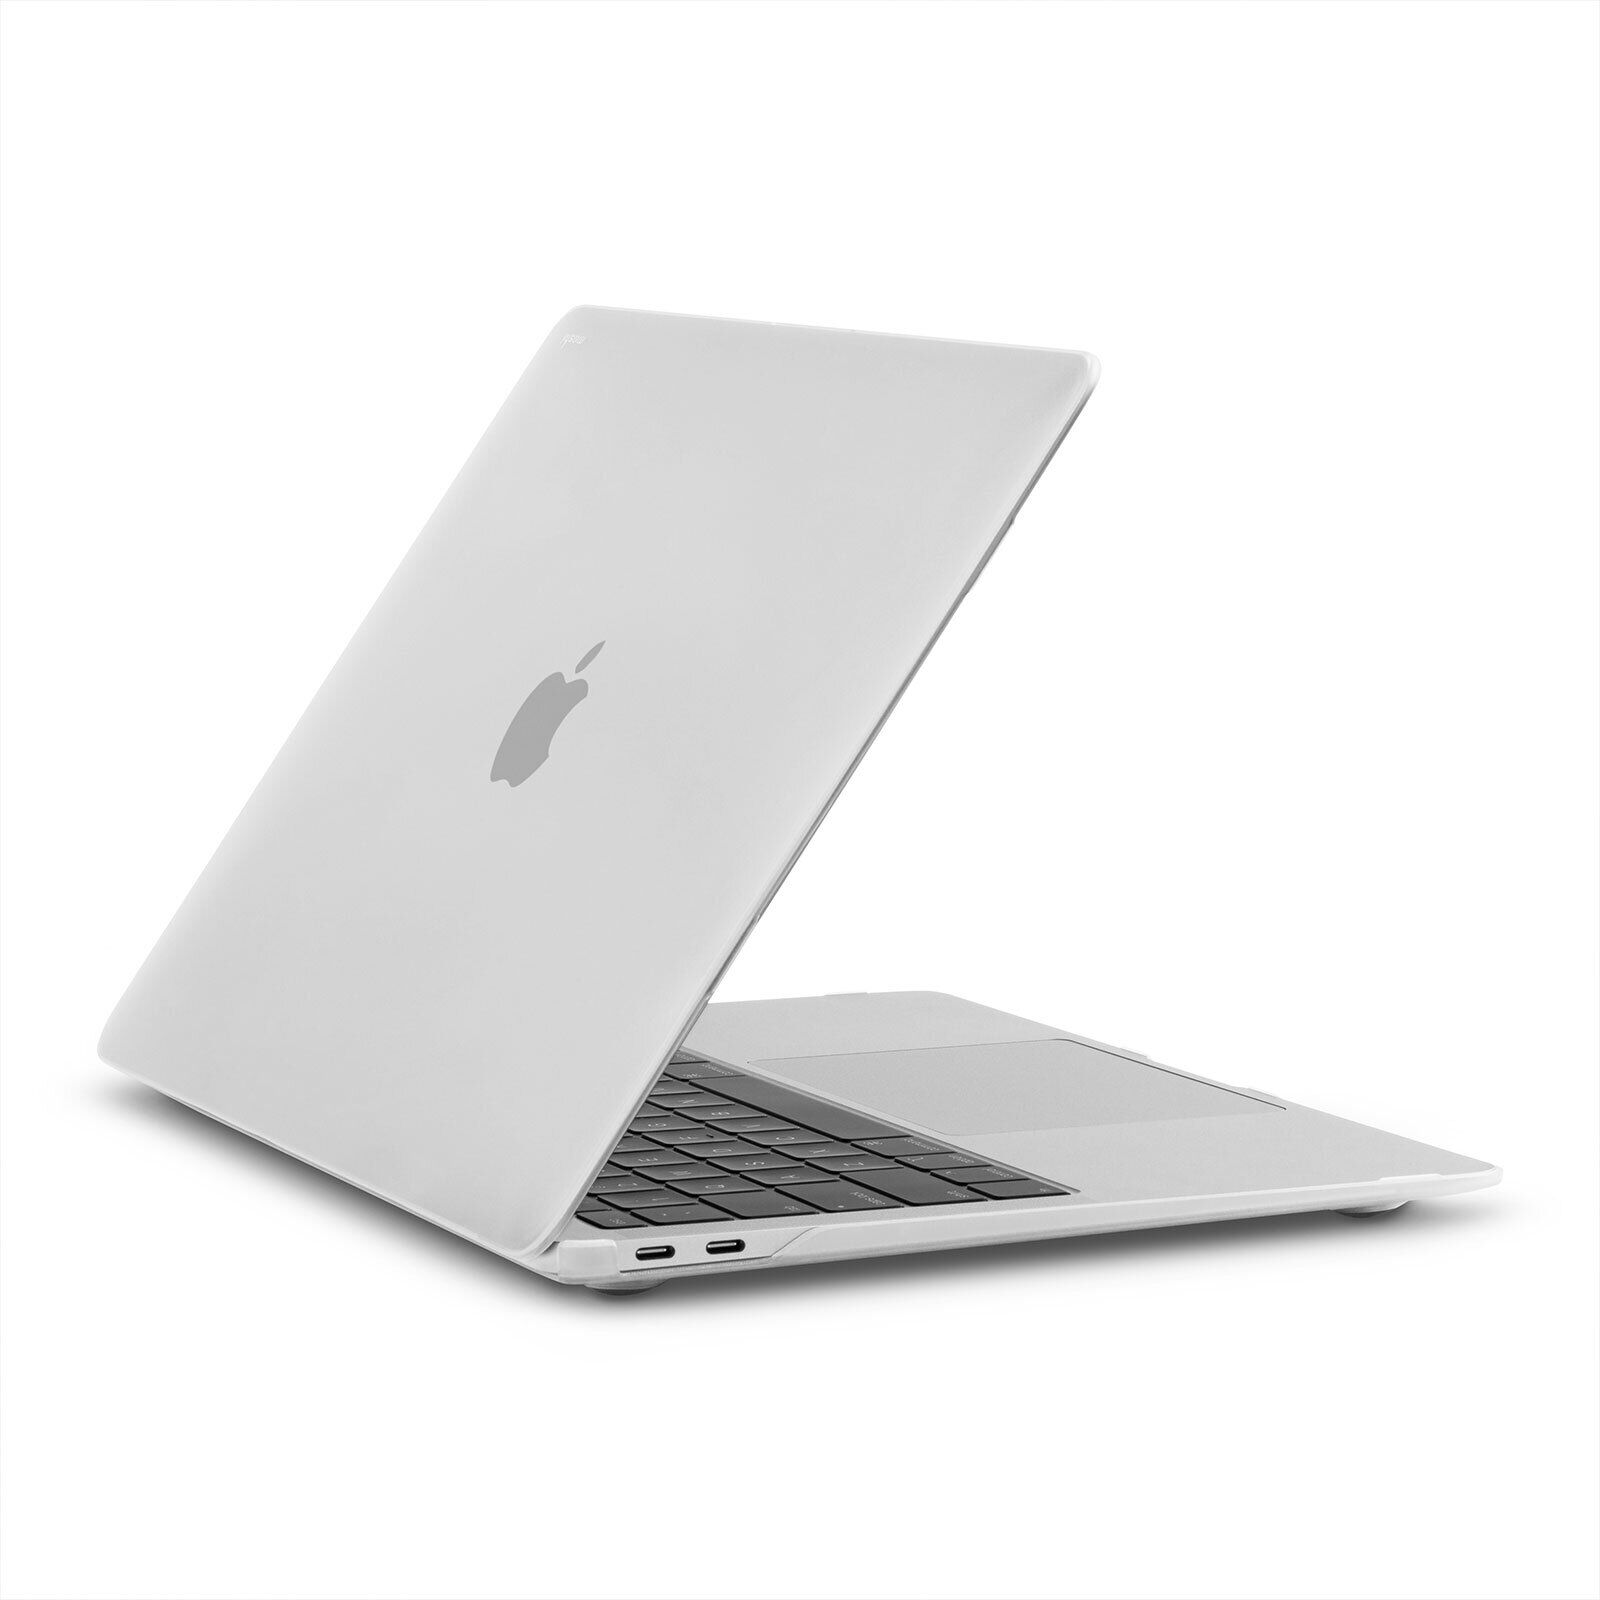 "Moshi Ultra Slim Case iGlaze Stealth Clear for MacBook Air 13"" Retina (99MO071909)"